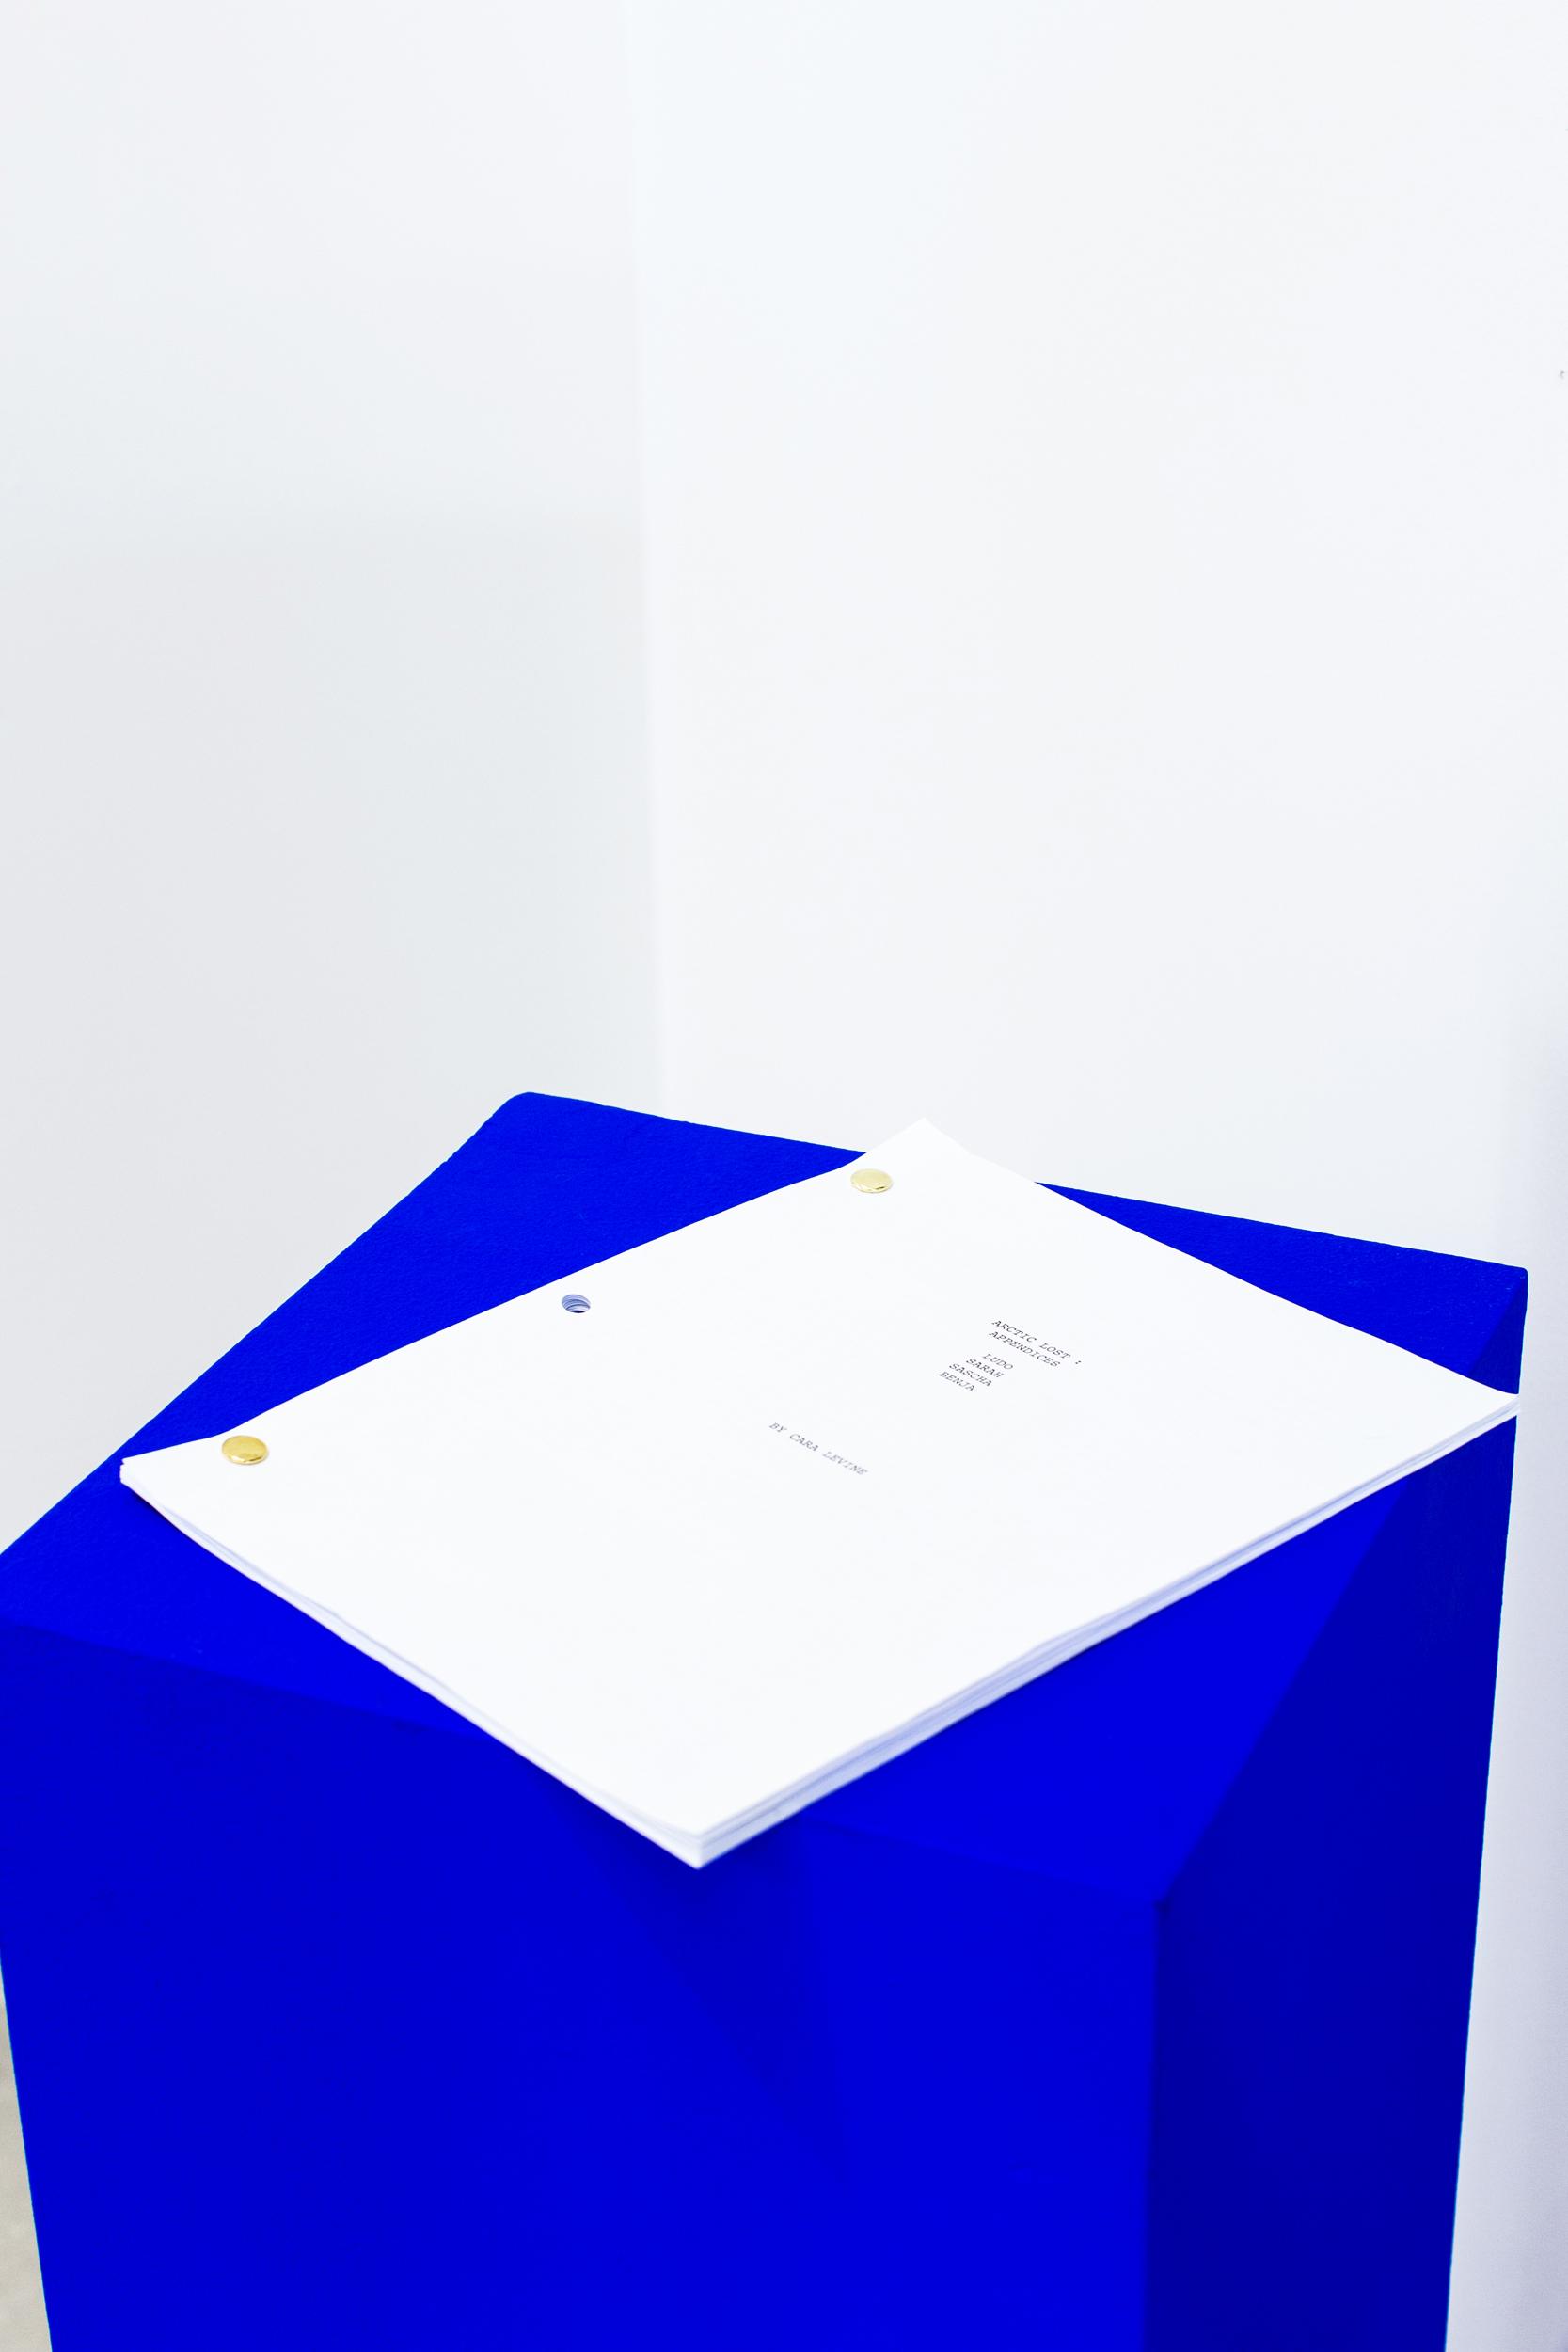 Cara Levine, Becoming Lost, Script, 2018